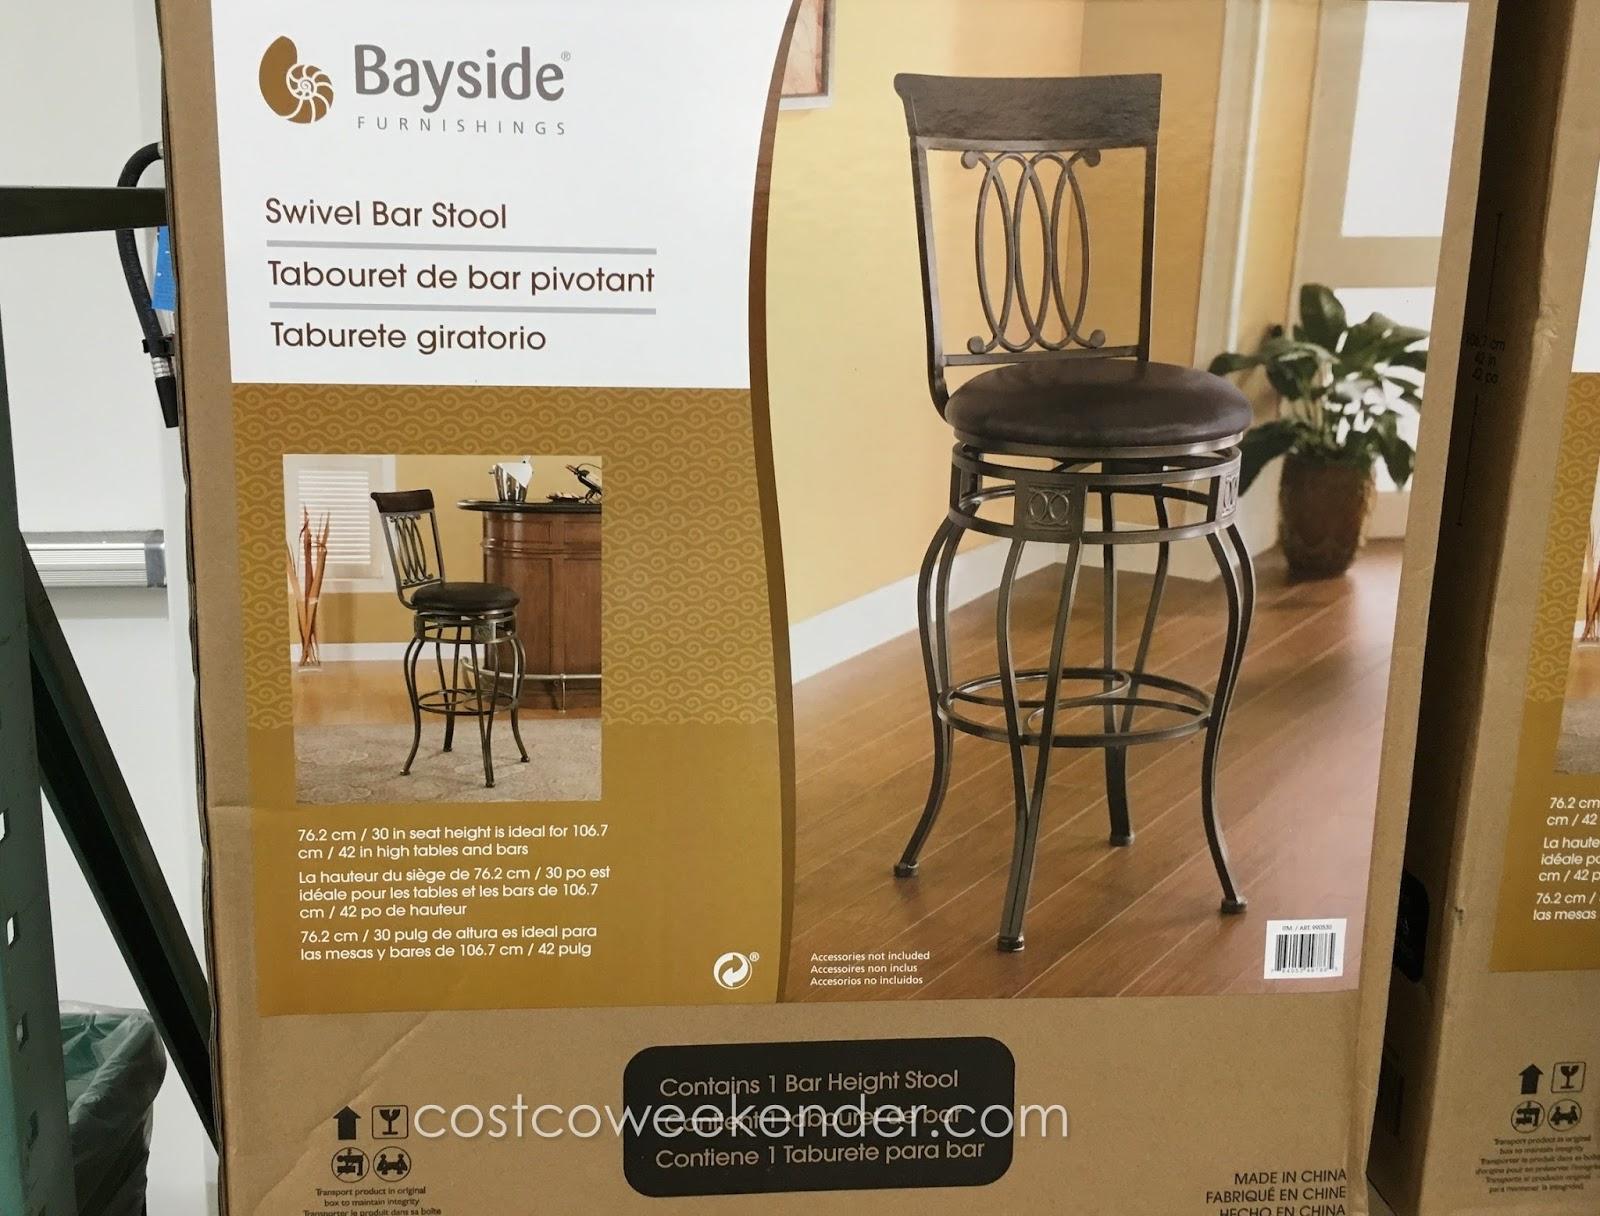 Strange Bayside Furnishings Swivel Bar Stool Costco Weekender Camellatalisay Diy Chair Ideas Camellatalisaycom